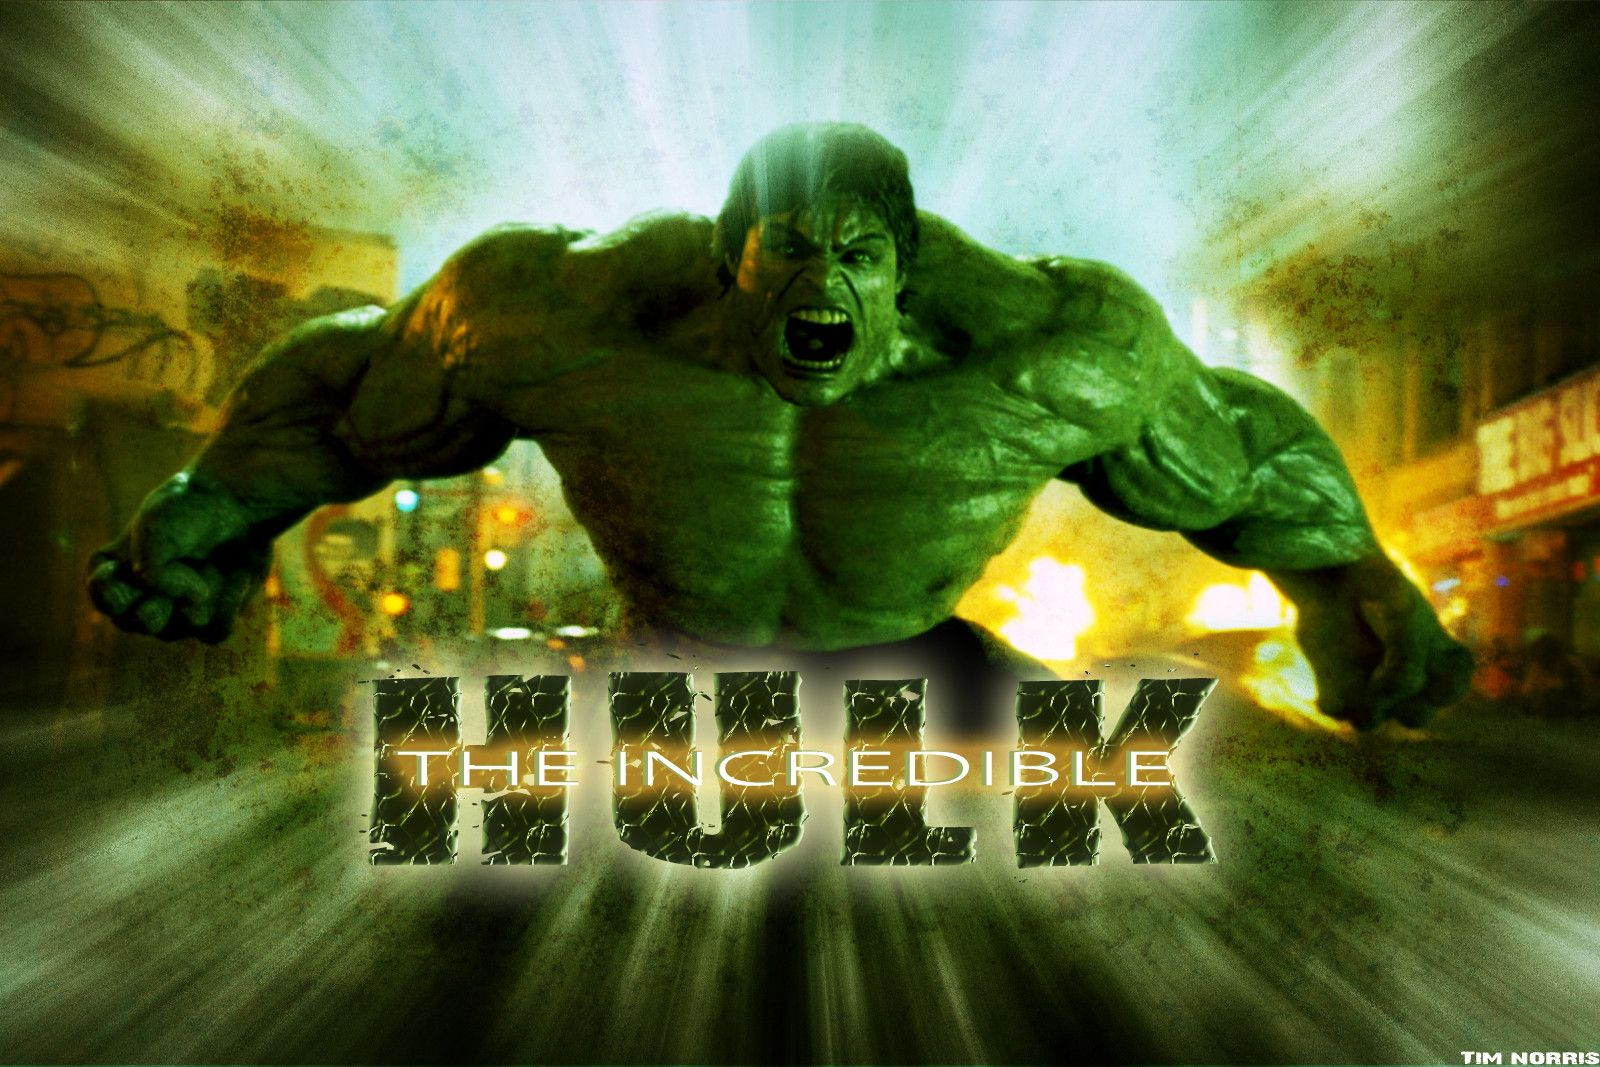 Hd wallpaper hulk - Incredible Hulk Hd Wallpapers Free Download Latest Incredible Hulk Hd Wallpapers For Computer Mobile